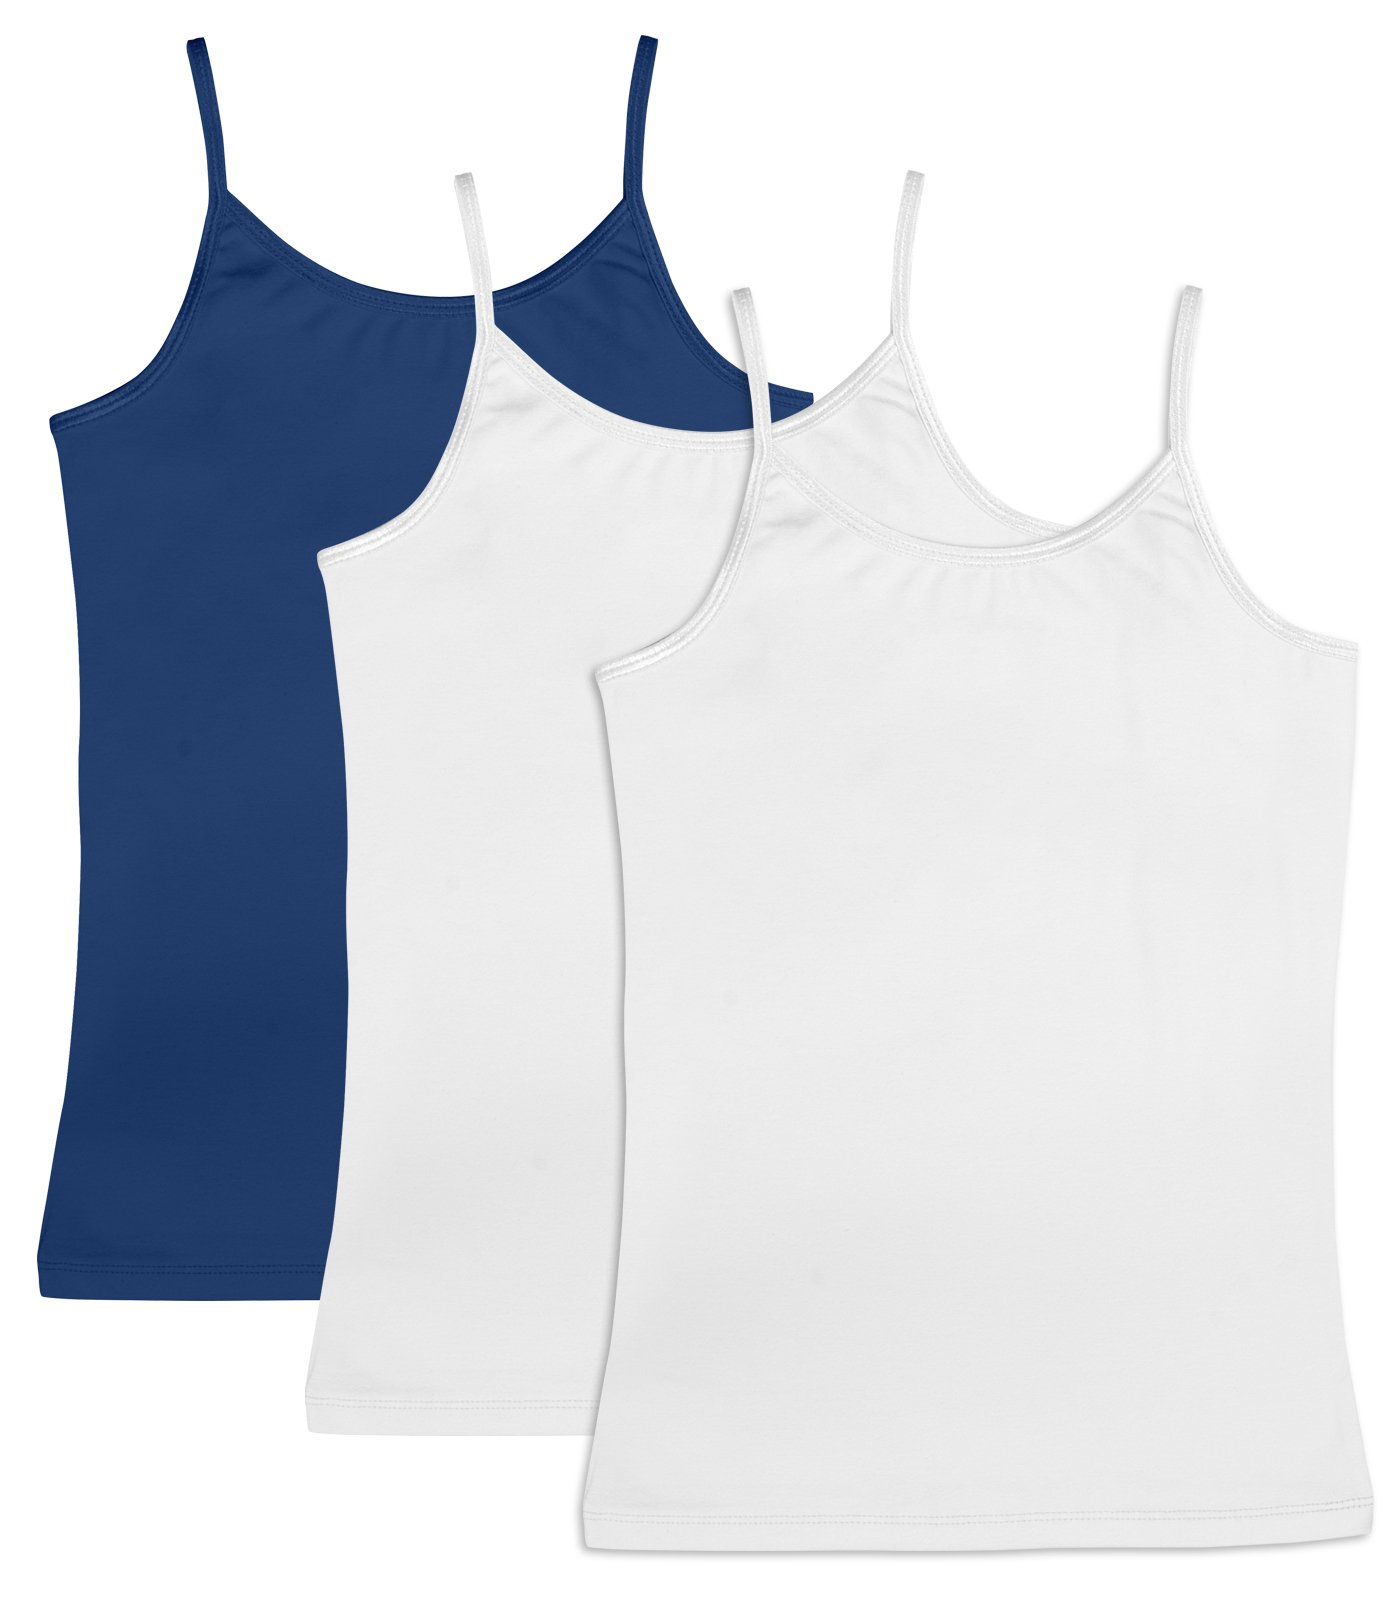 Caomp Girl's Cami Tank Tops (3-Pack) Organic Cotton Spandex Undershirts  Adjustable Spaghetti Straps Navy/White/White 15/16